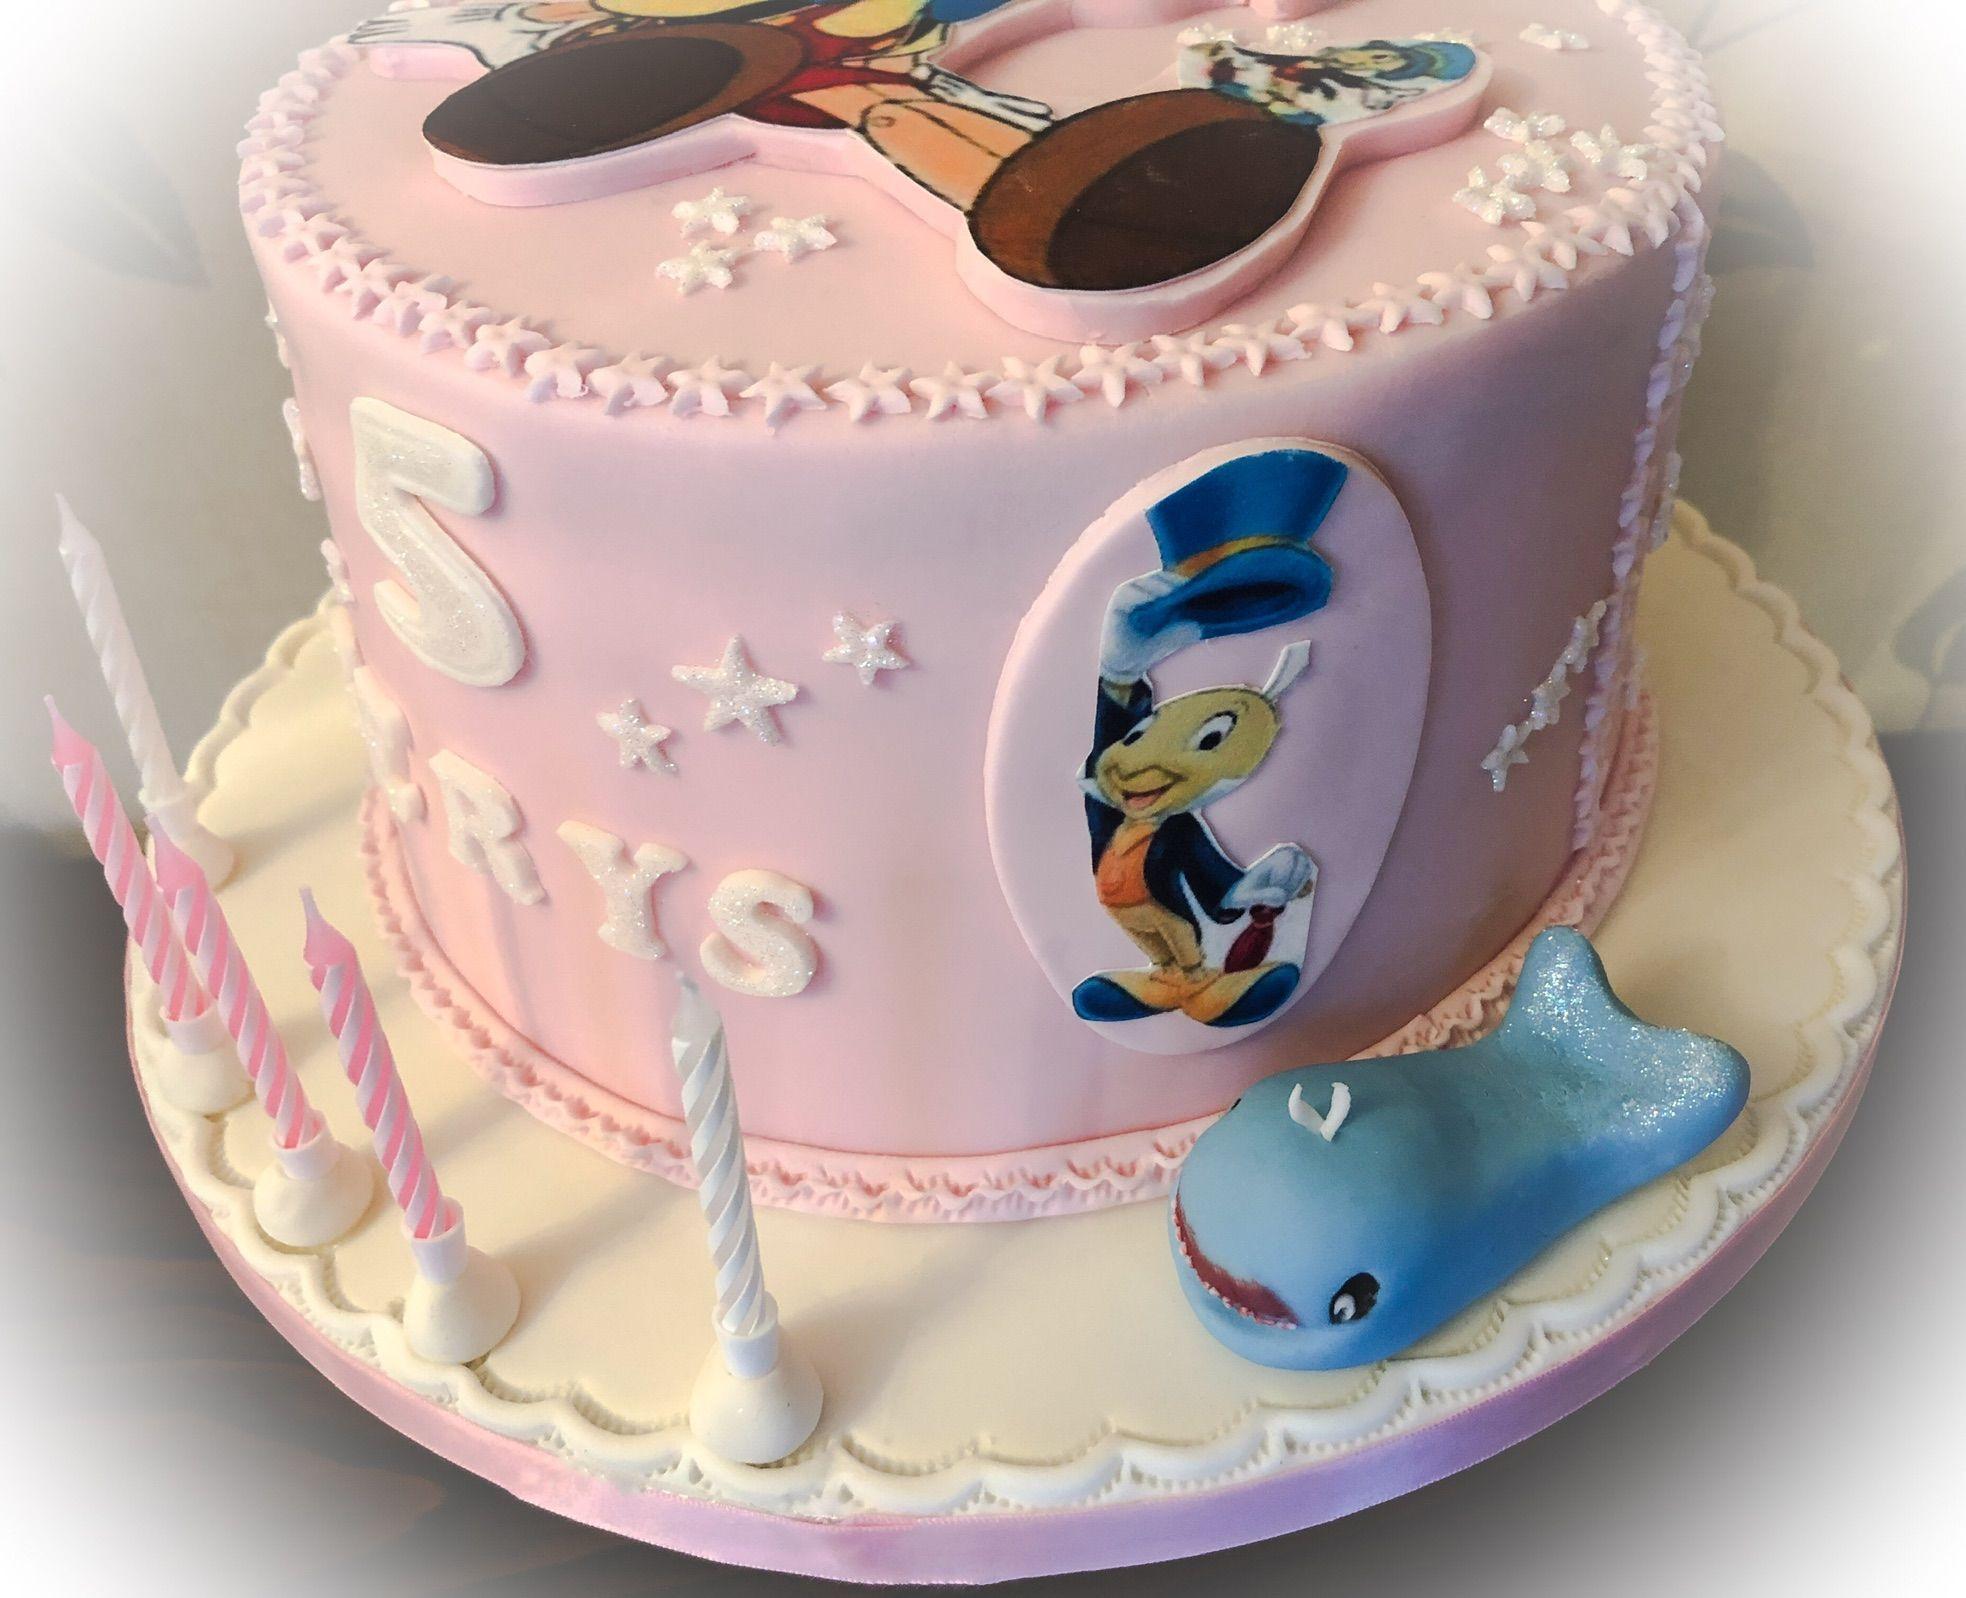 pinocchio cake 1